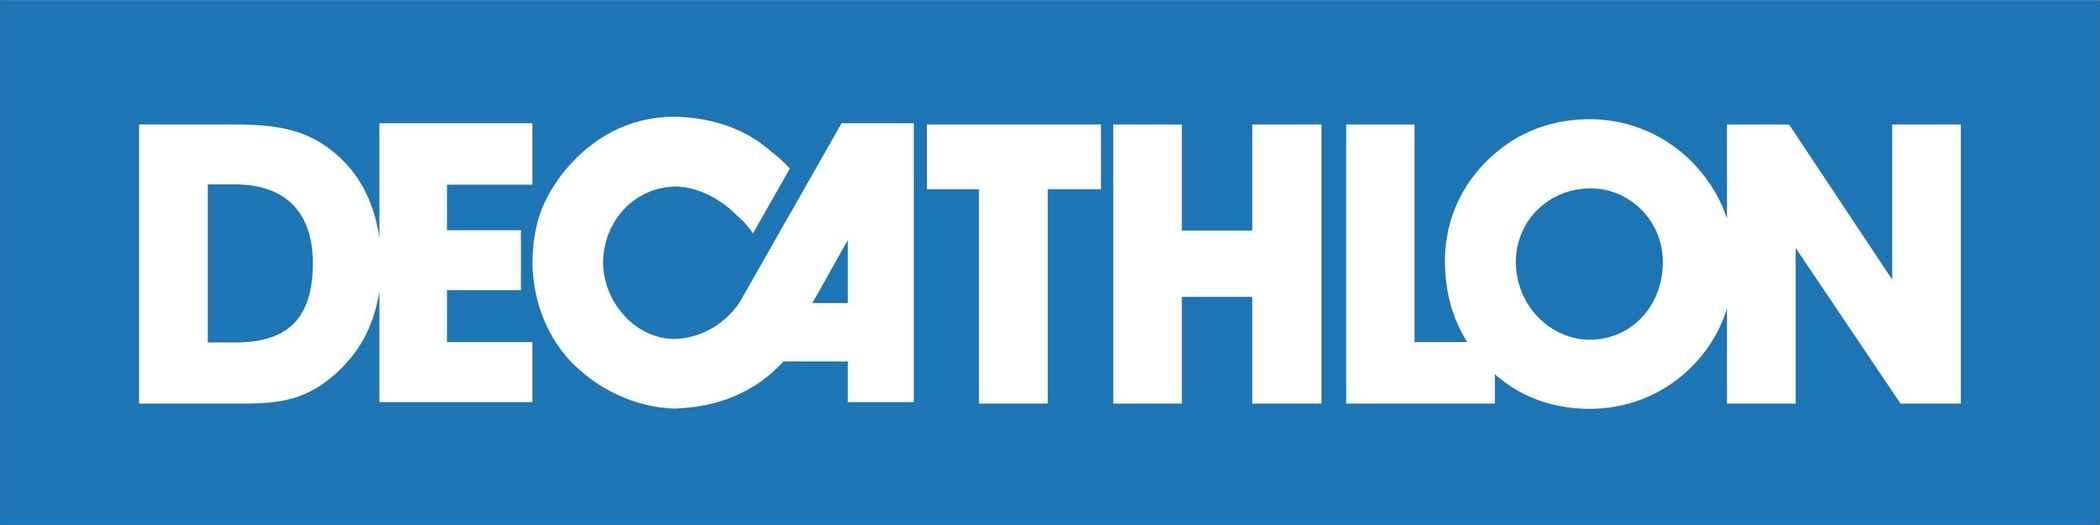 Decathlon Logo [PDF] Vector EPS Free Download, Logo, Icons, Brand Emblems